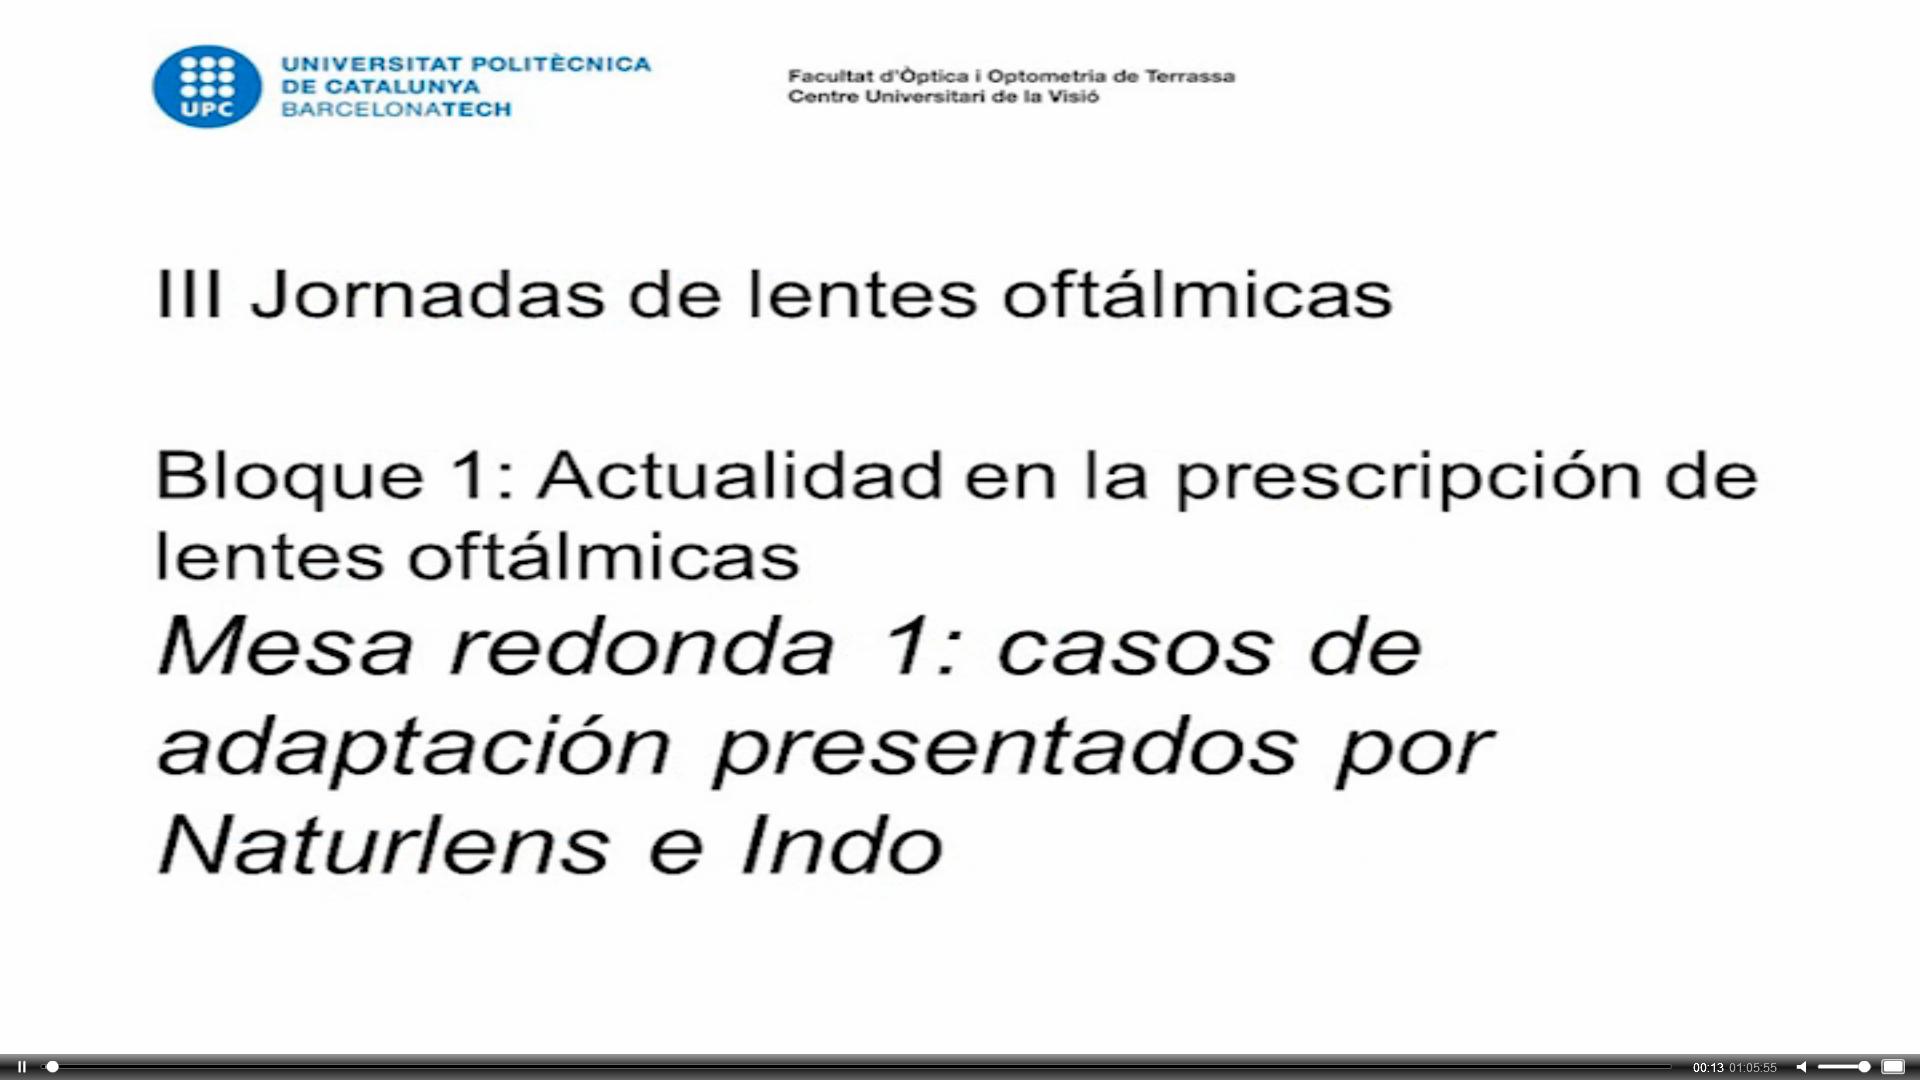 JLO2016_lentes_oftalmicas_mesa_redonda_2(Naturlens-Indo)